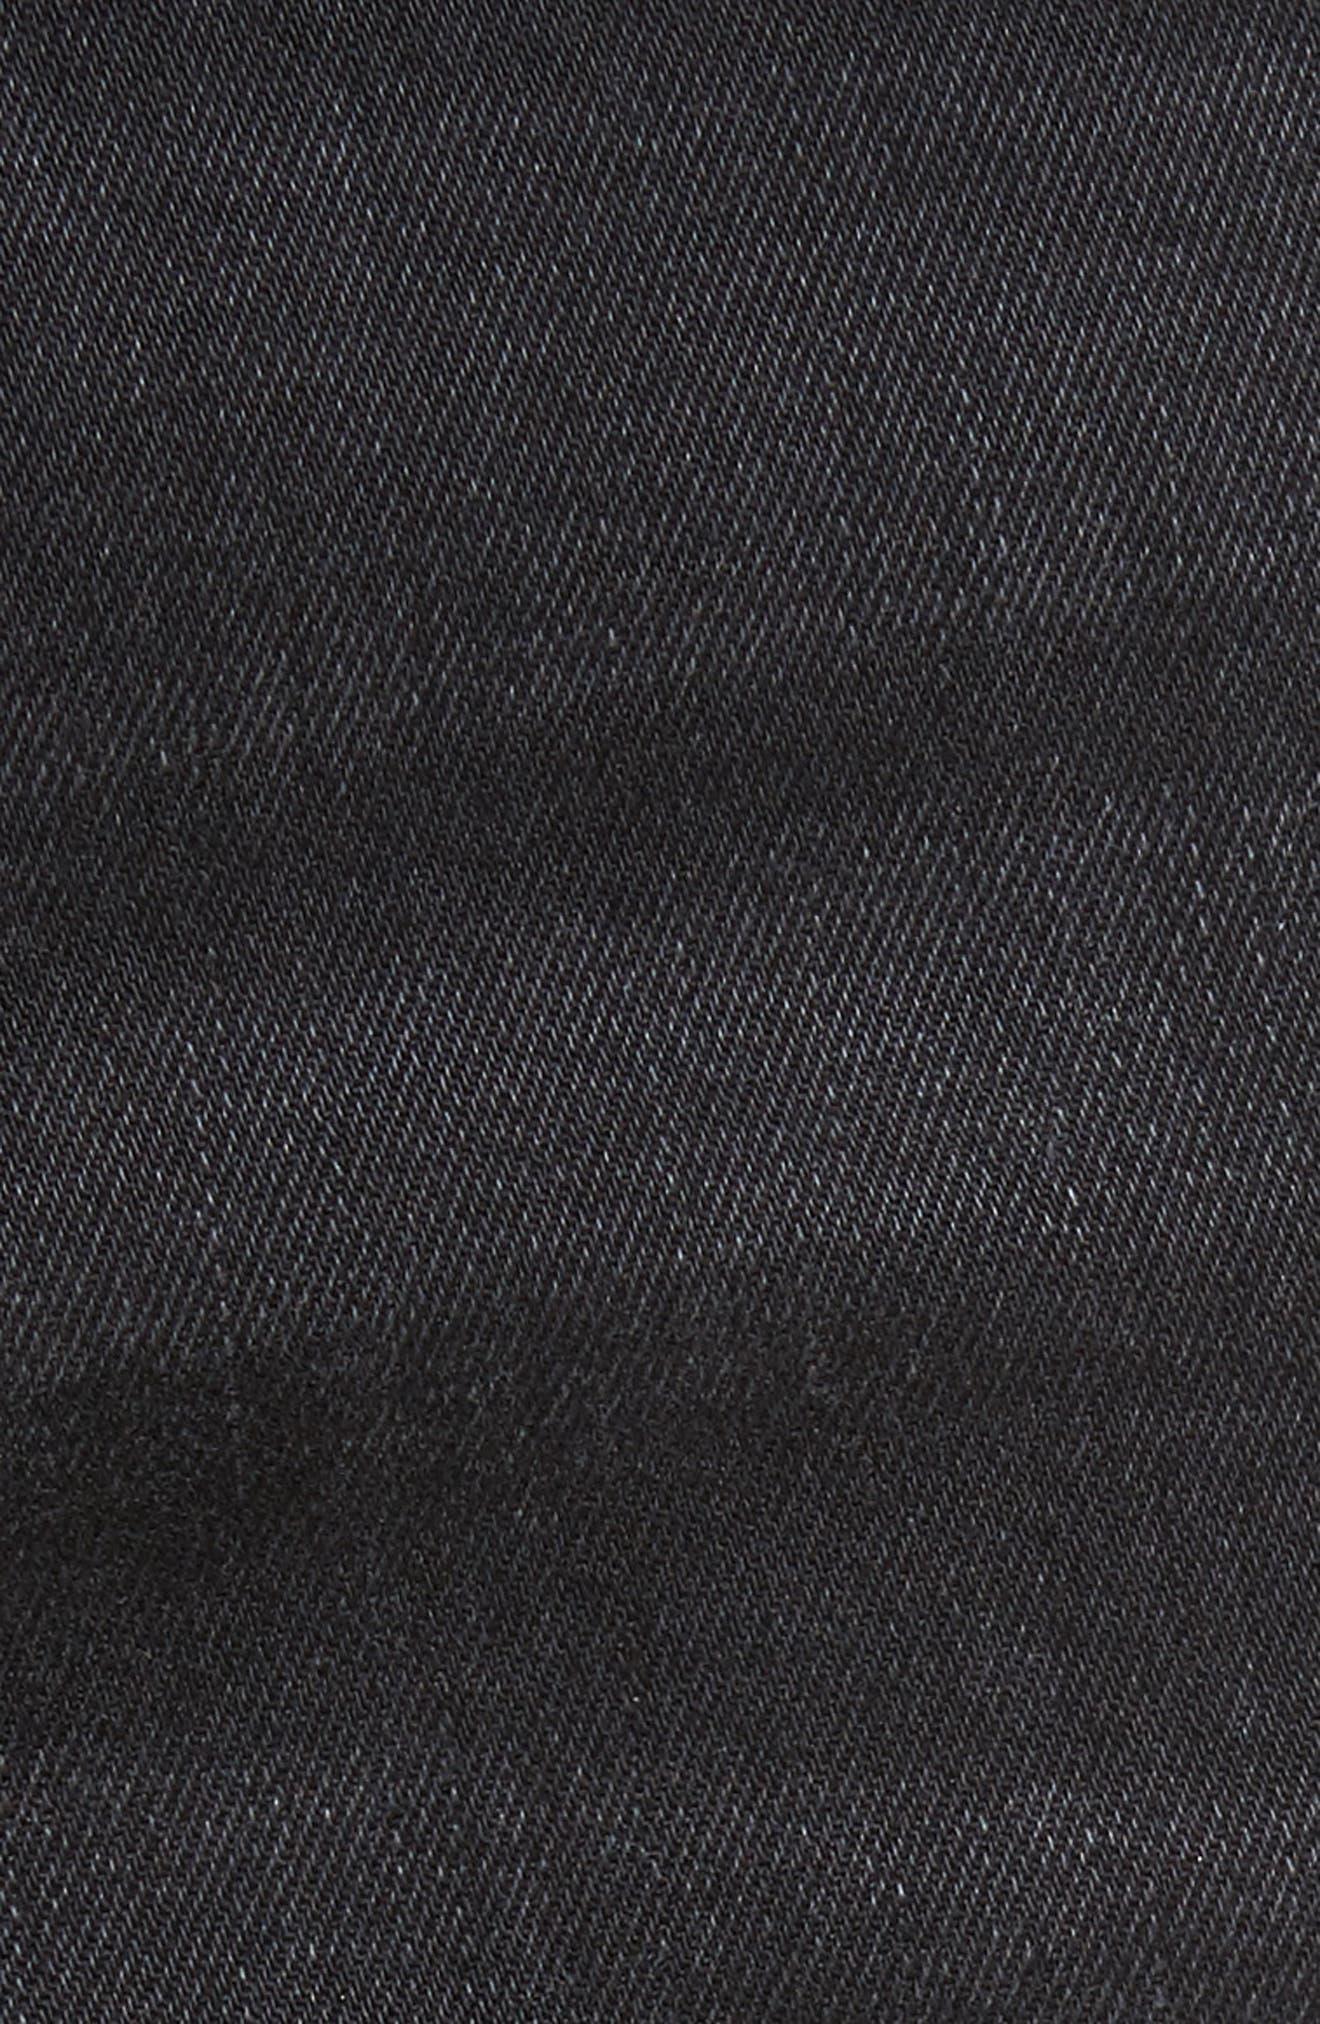 Hunter Skinny Jeans,                             Alternate thumbnail 5, color,                             001